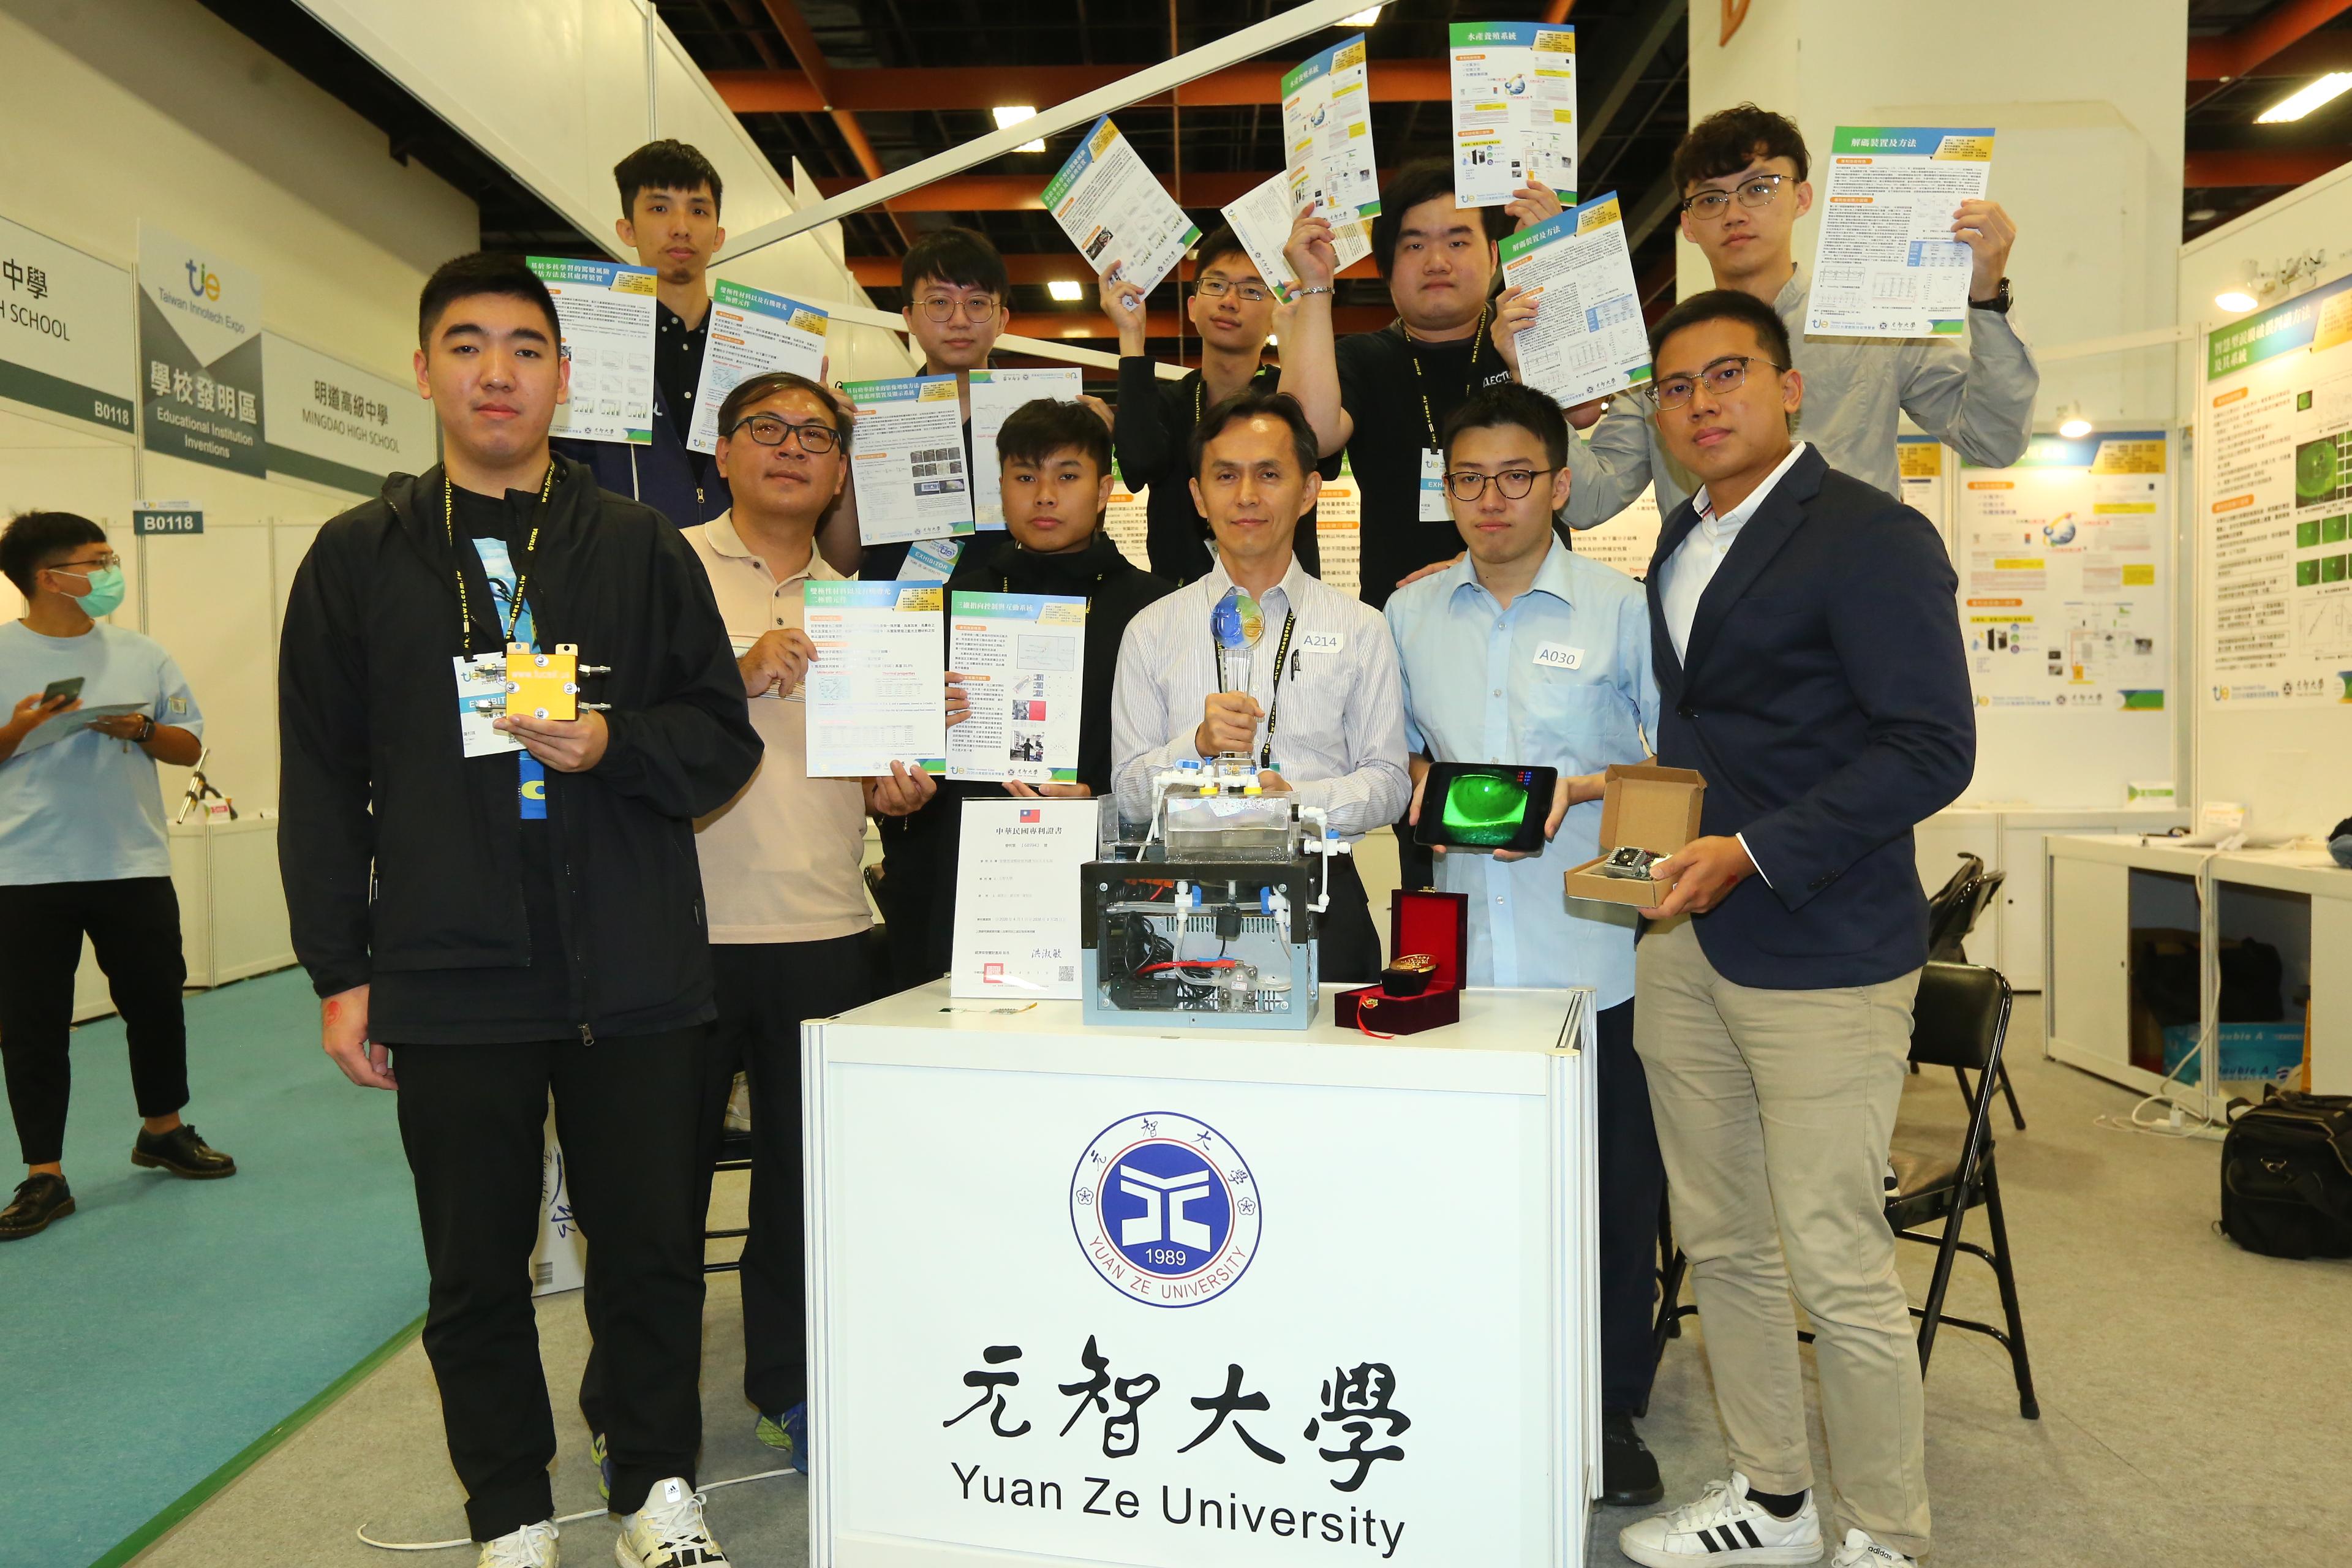 https://storage.googleapis.com/www.taiwantradeshow.com.tw/activity-photo/202009/T-29360414-name.jpg